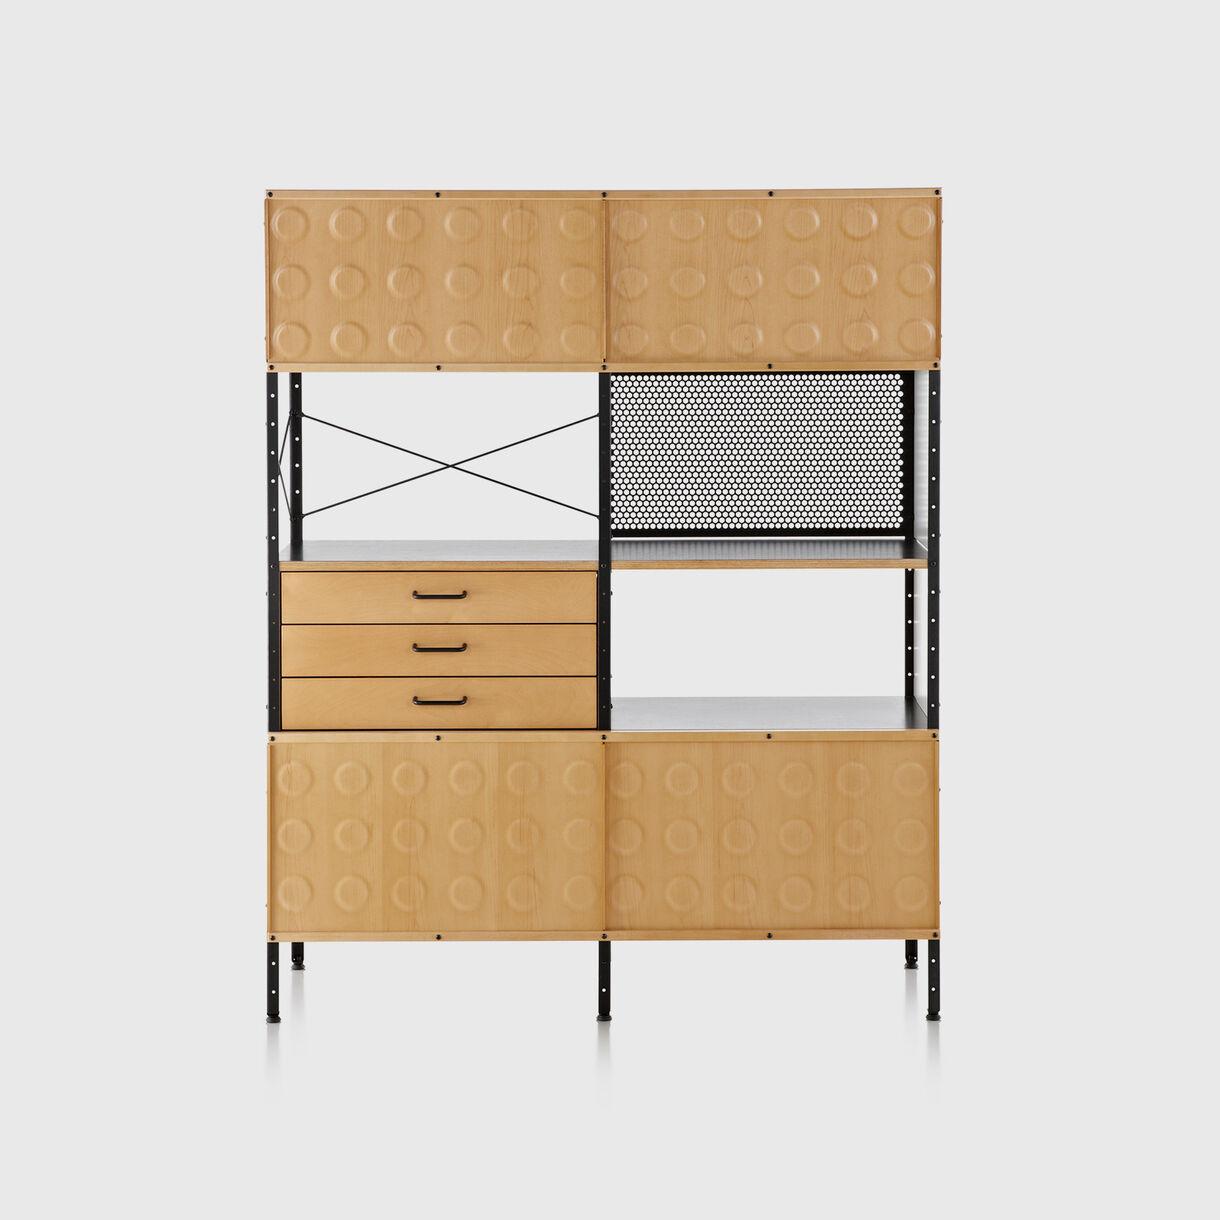 Eames Storage Unit, 4x2